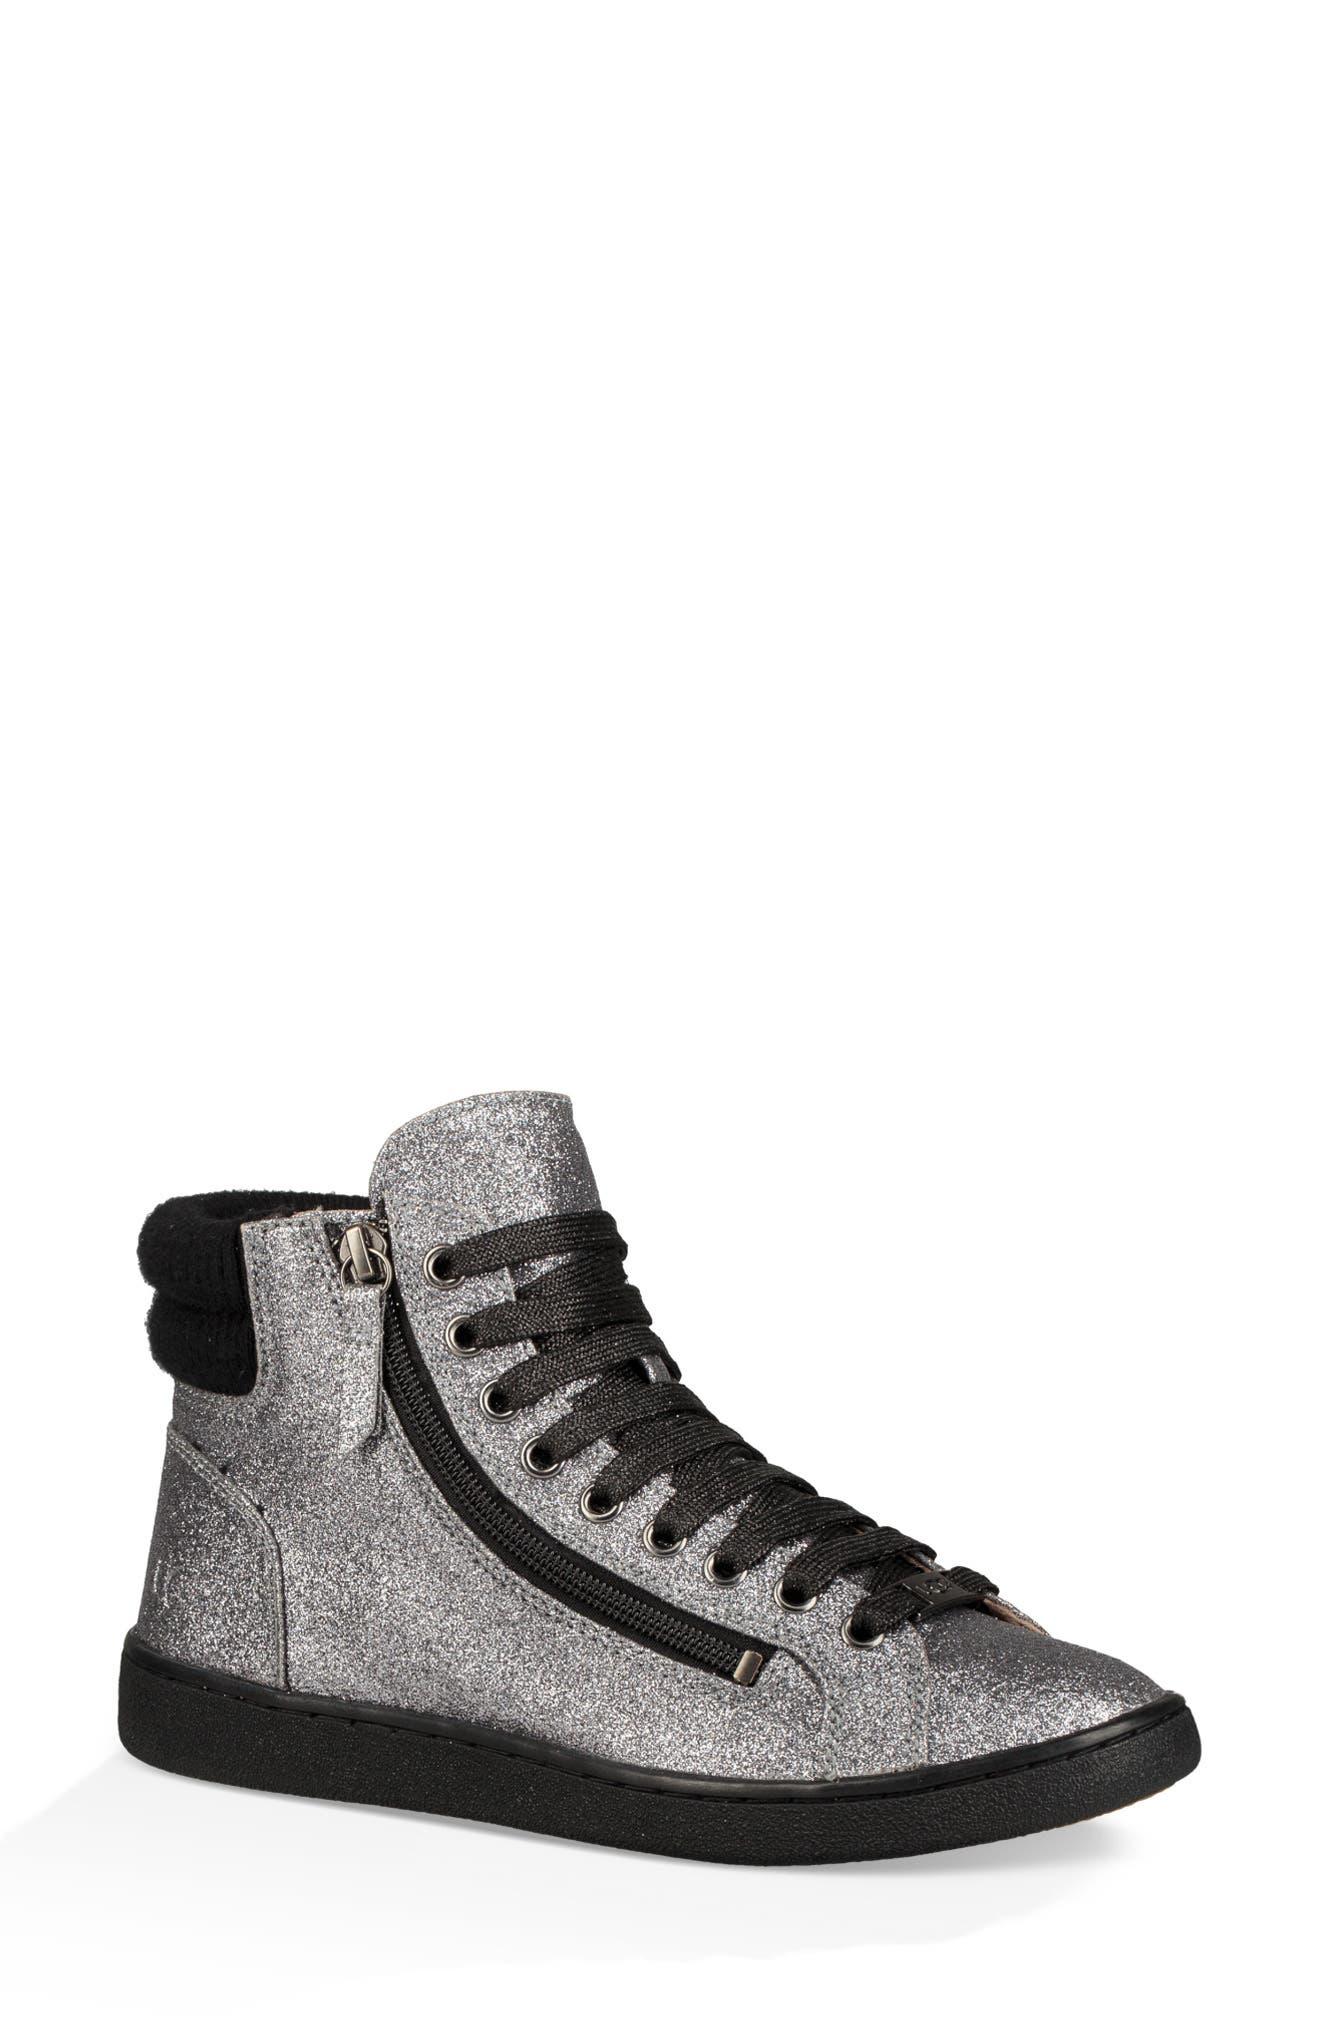 Olive Glitter Sneaker,                             Main thumbnail 1, color,                             GUNMETAL FABRIC